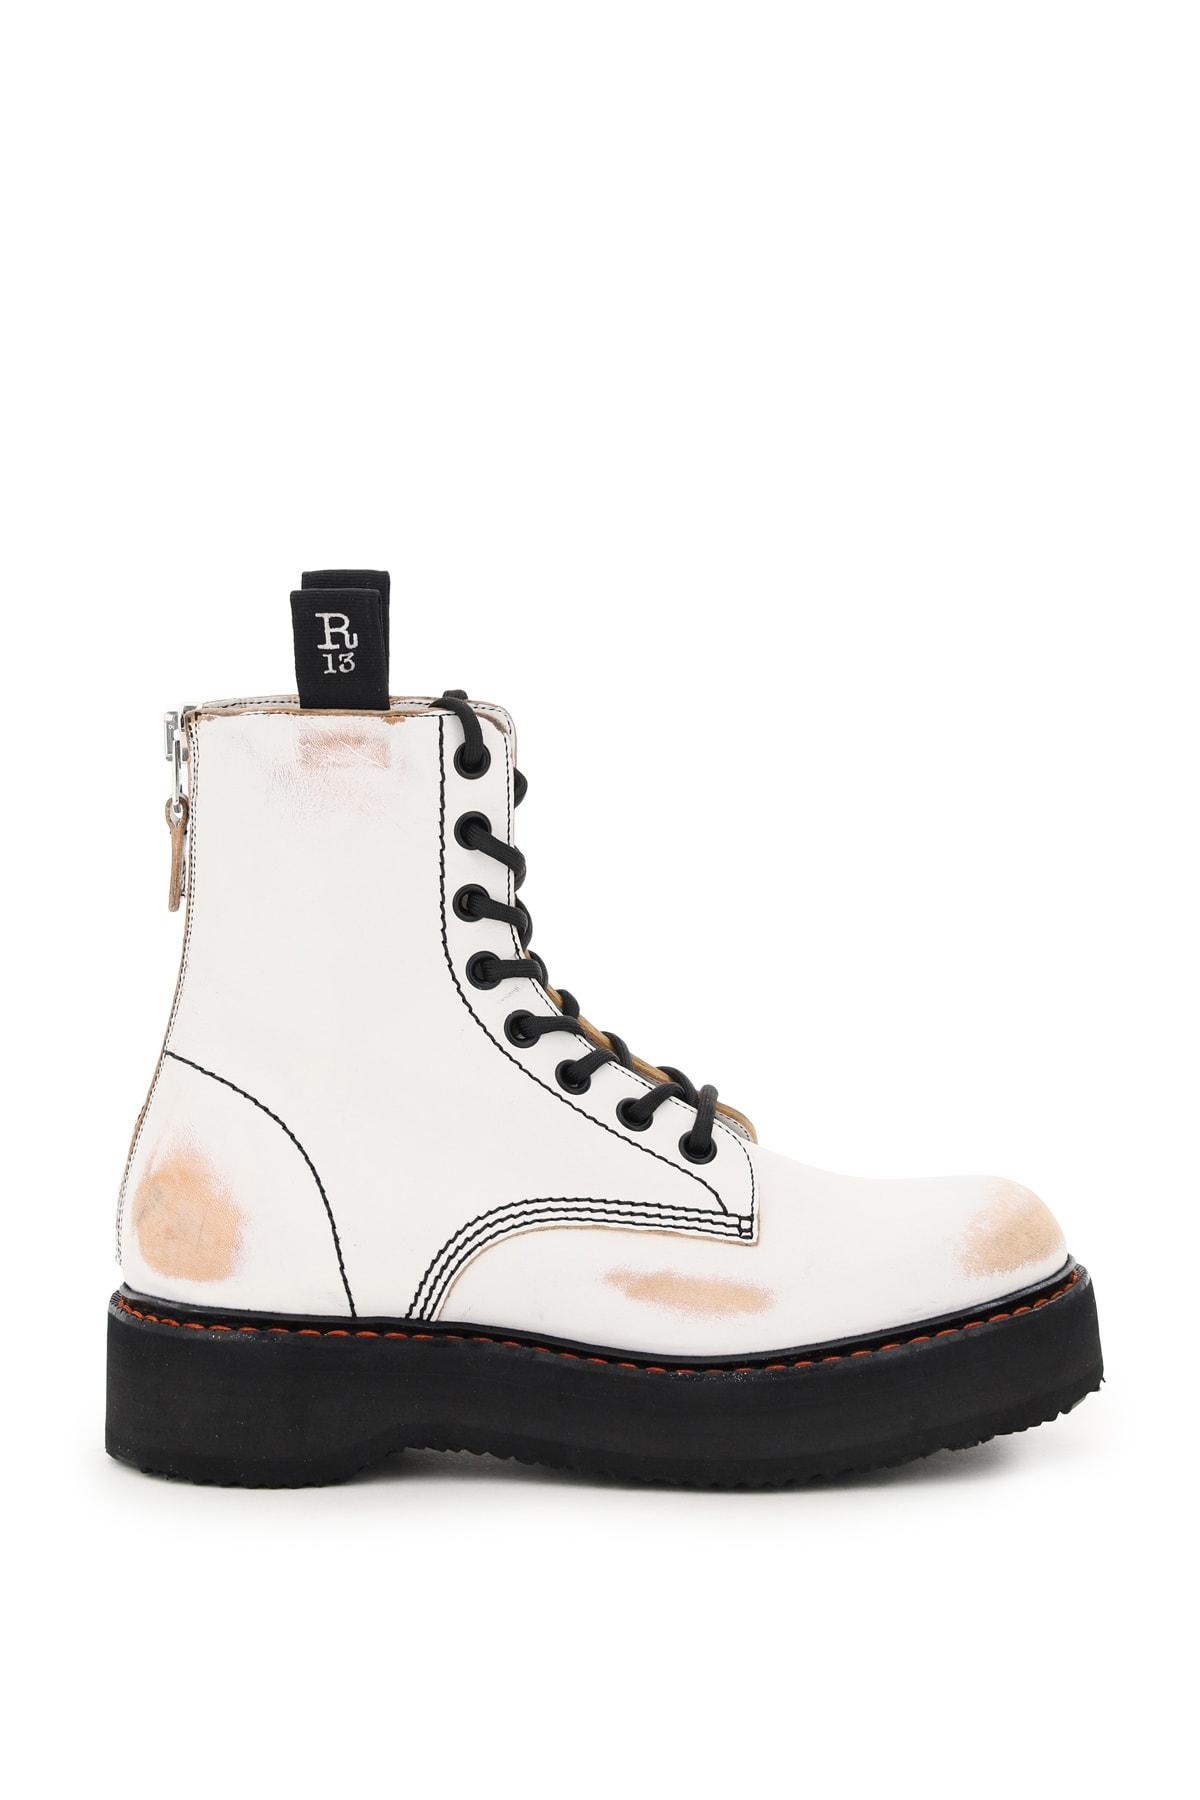 R13 Combat Boots